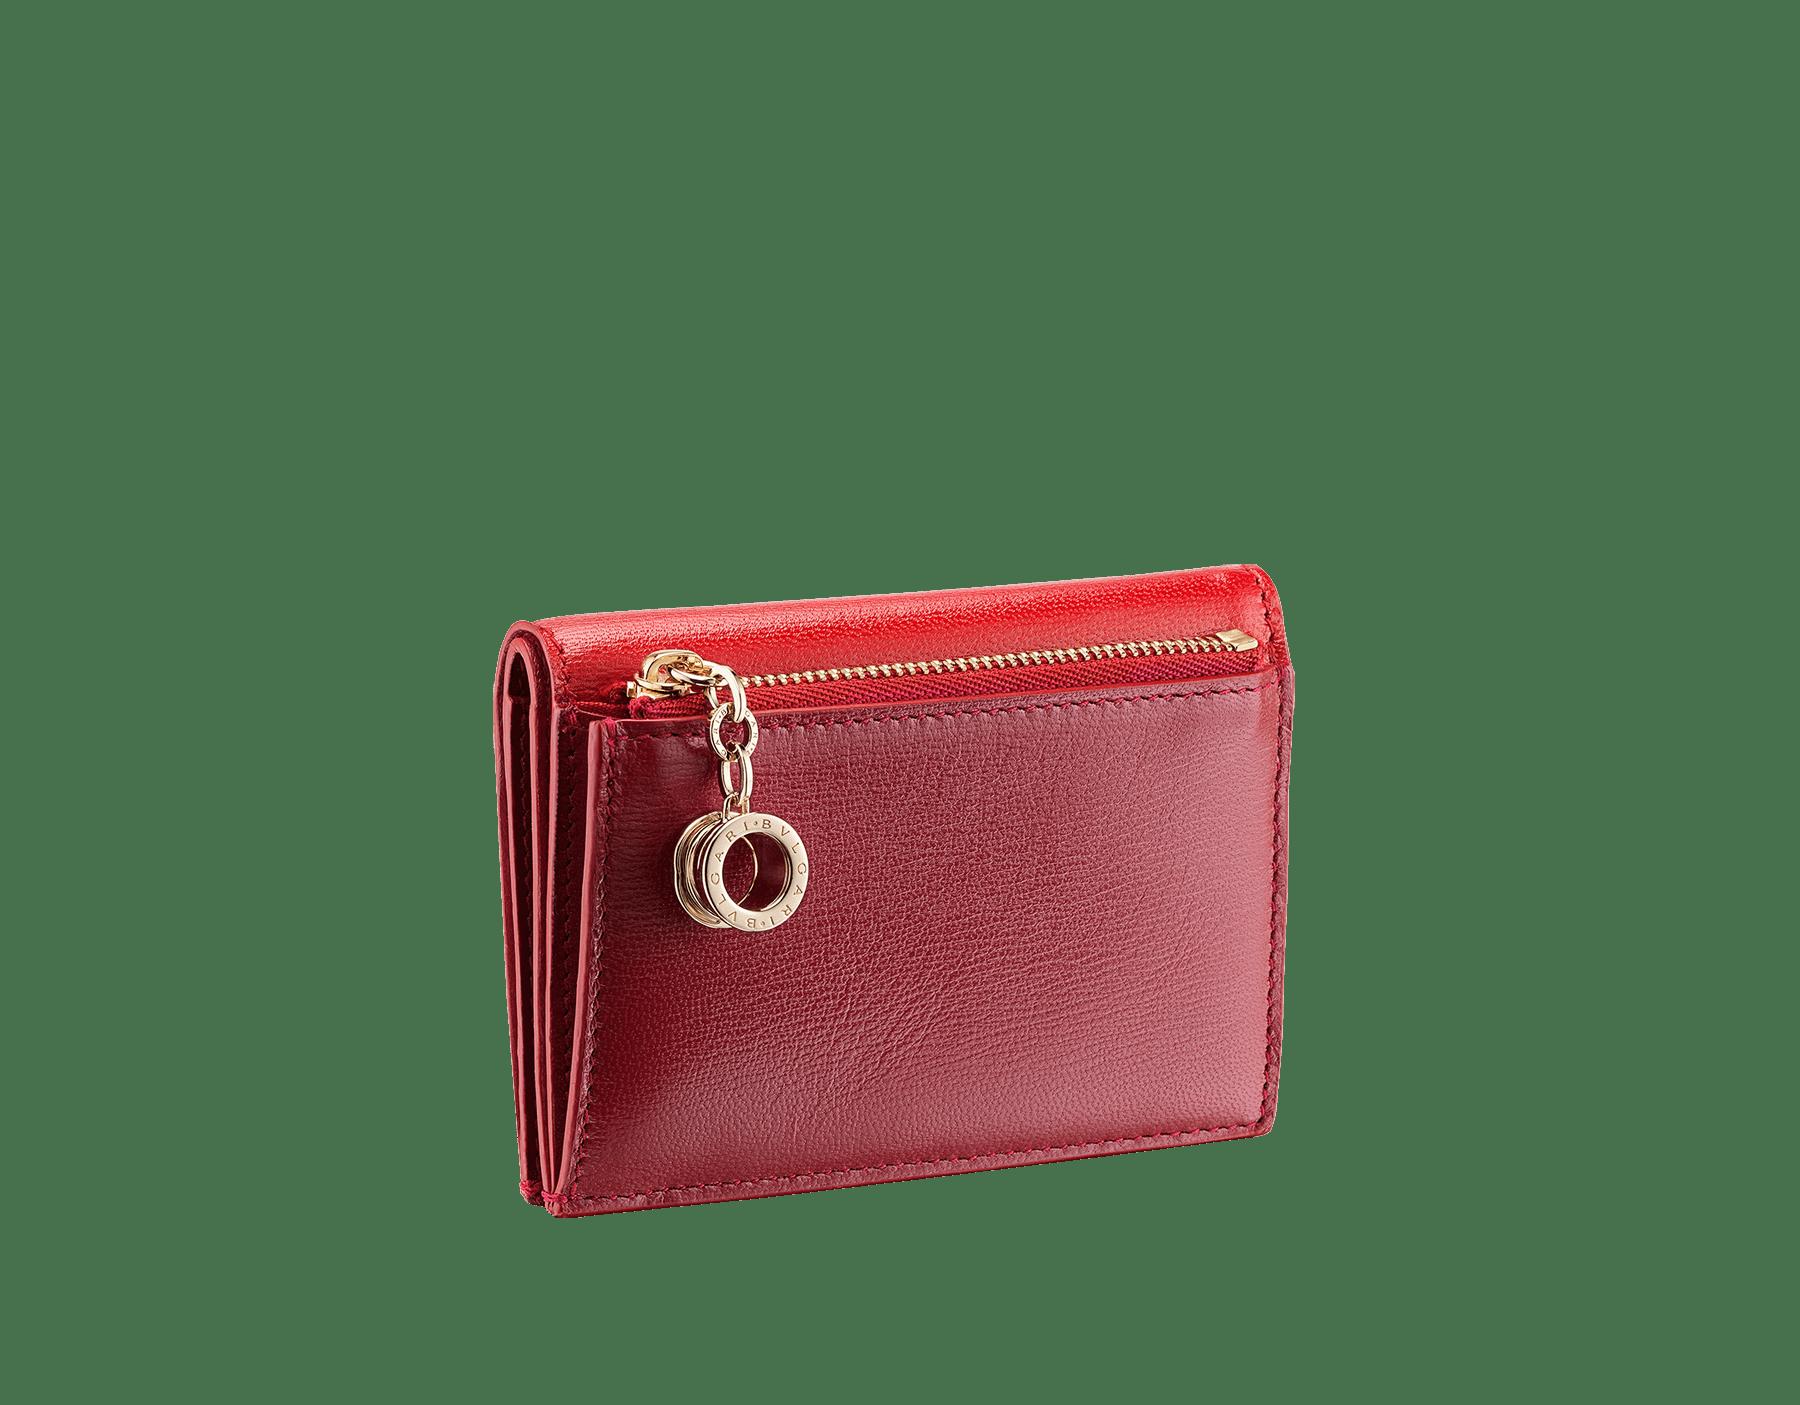 """B.zero1""胭脂碧玉色和红宝石色山羊皮双折叠信用卡夹。浅金镀金黄铜经典B.zero1吊饰。 289151 image 3"